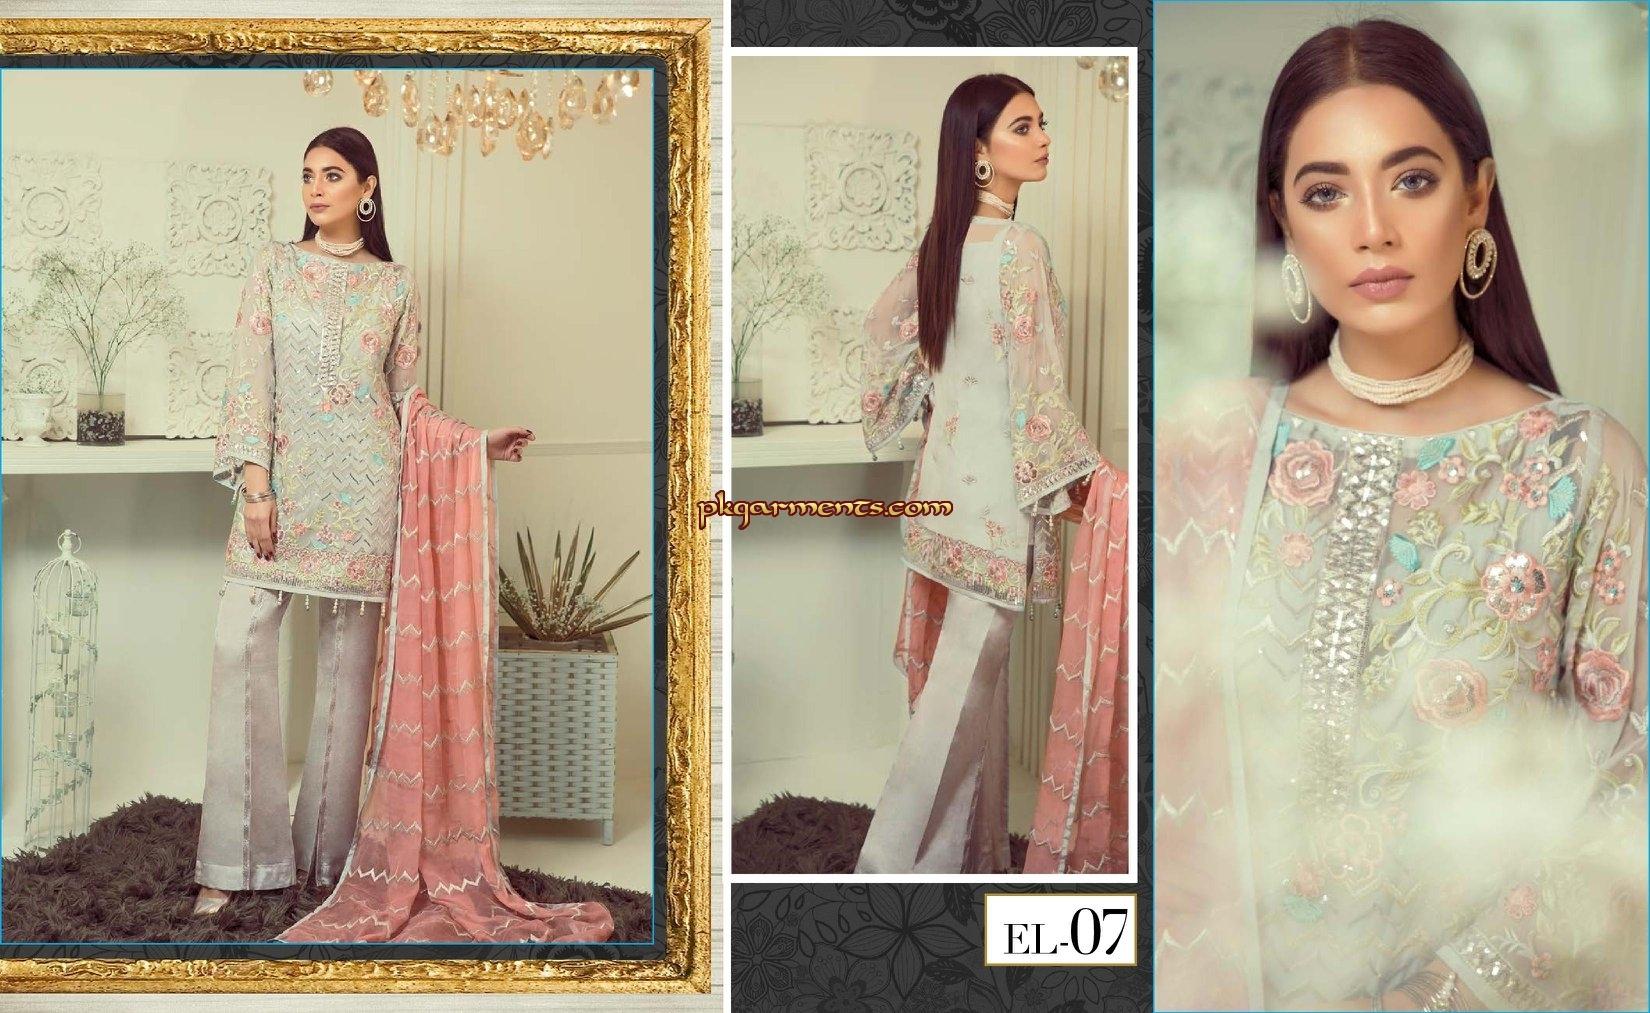 77394a8ff3 Elaf Premium Chiffon Collection 2019 | Pakistani Clothes & Fashion ...